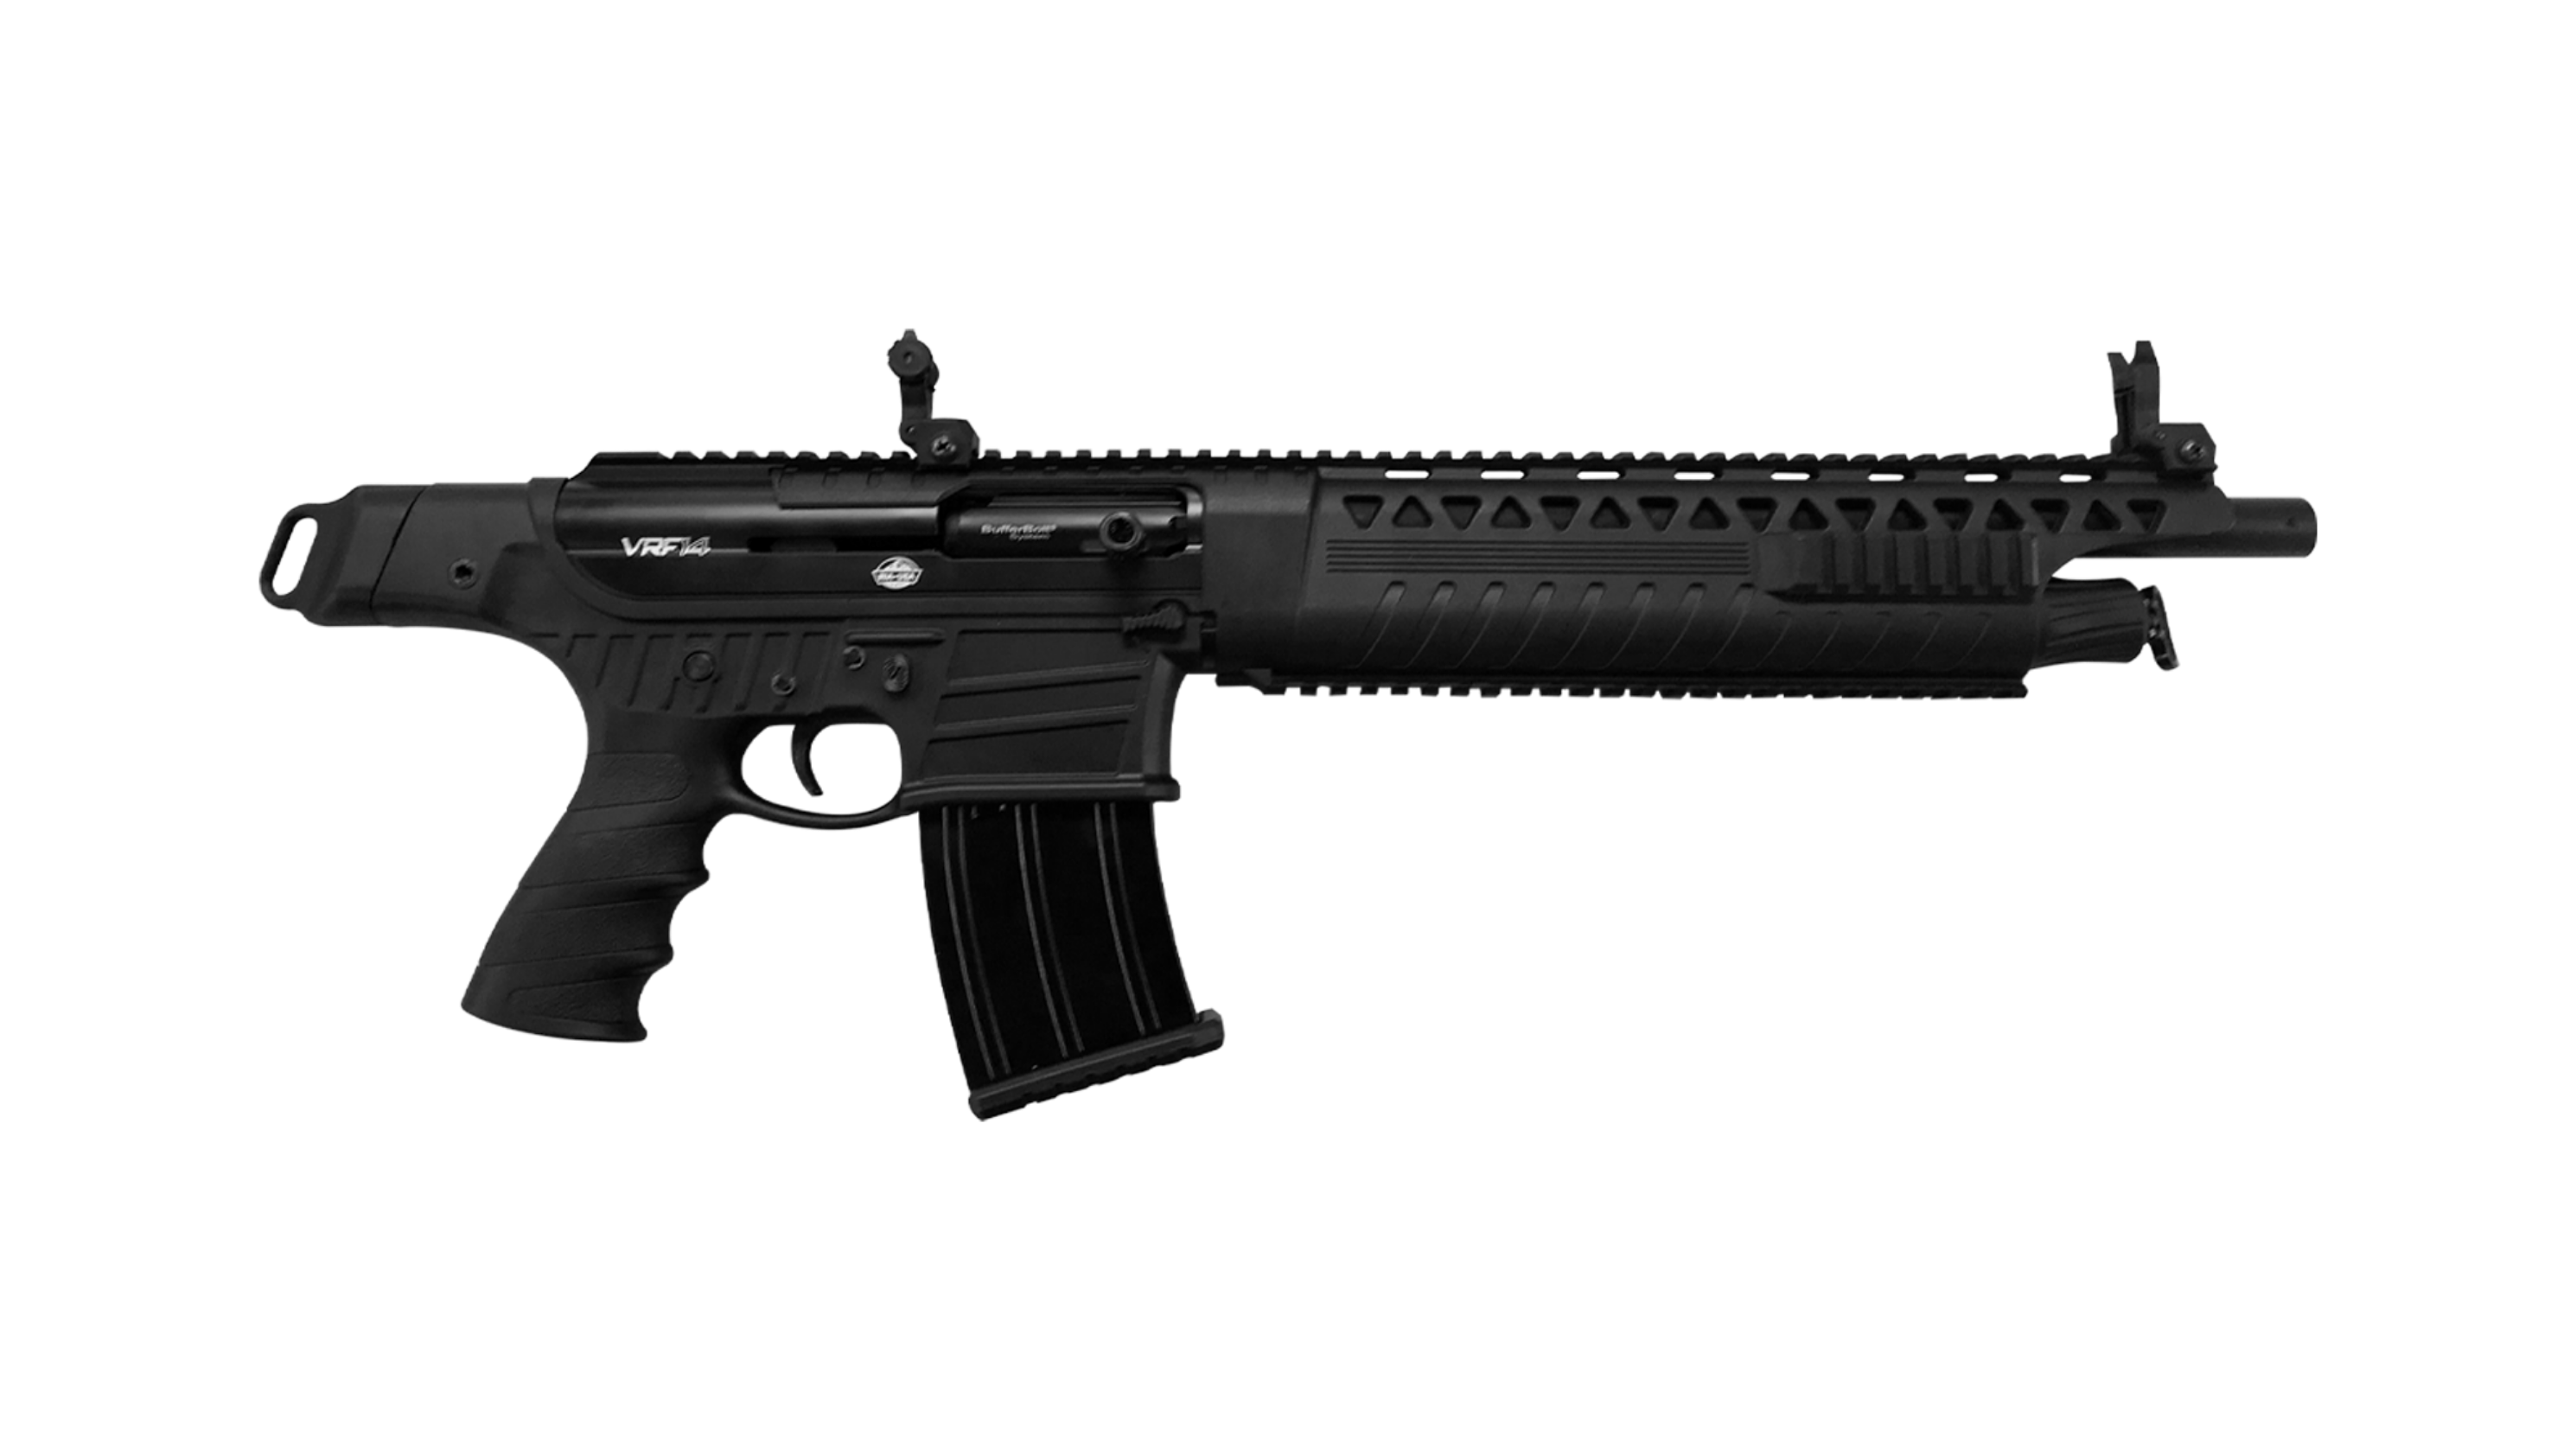 VRF14-prod